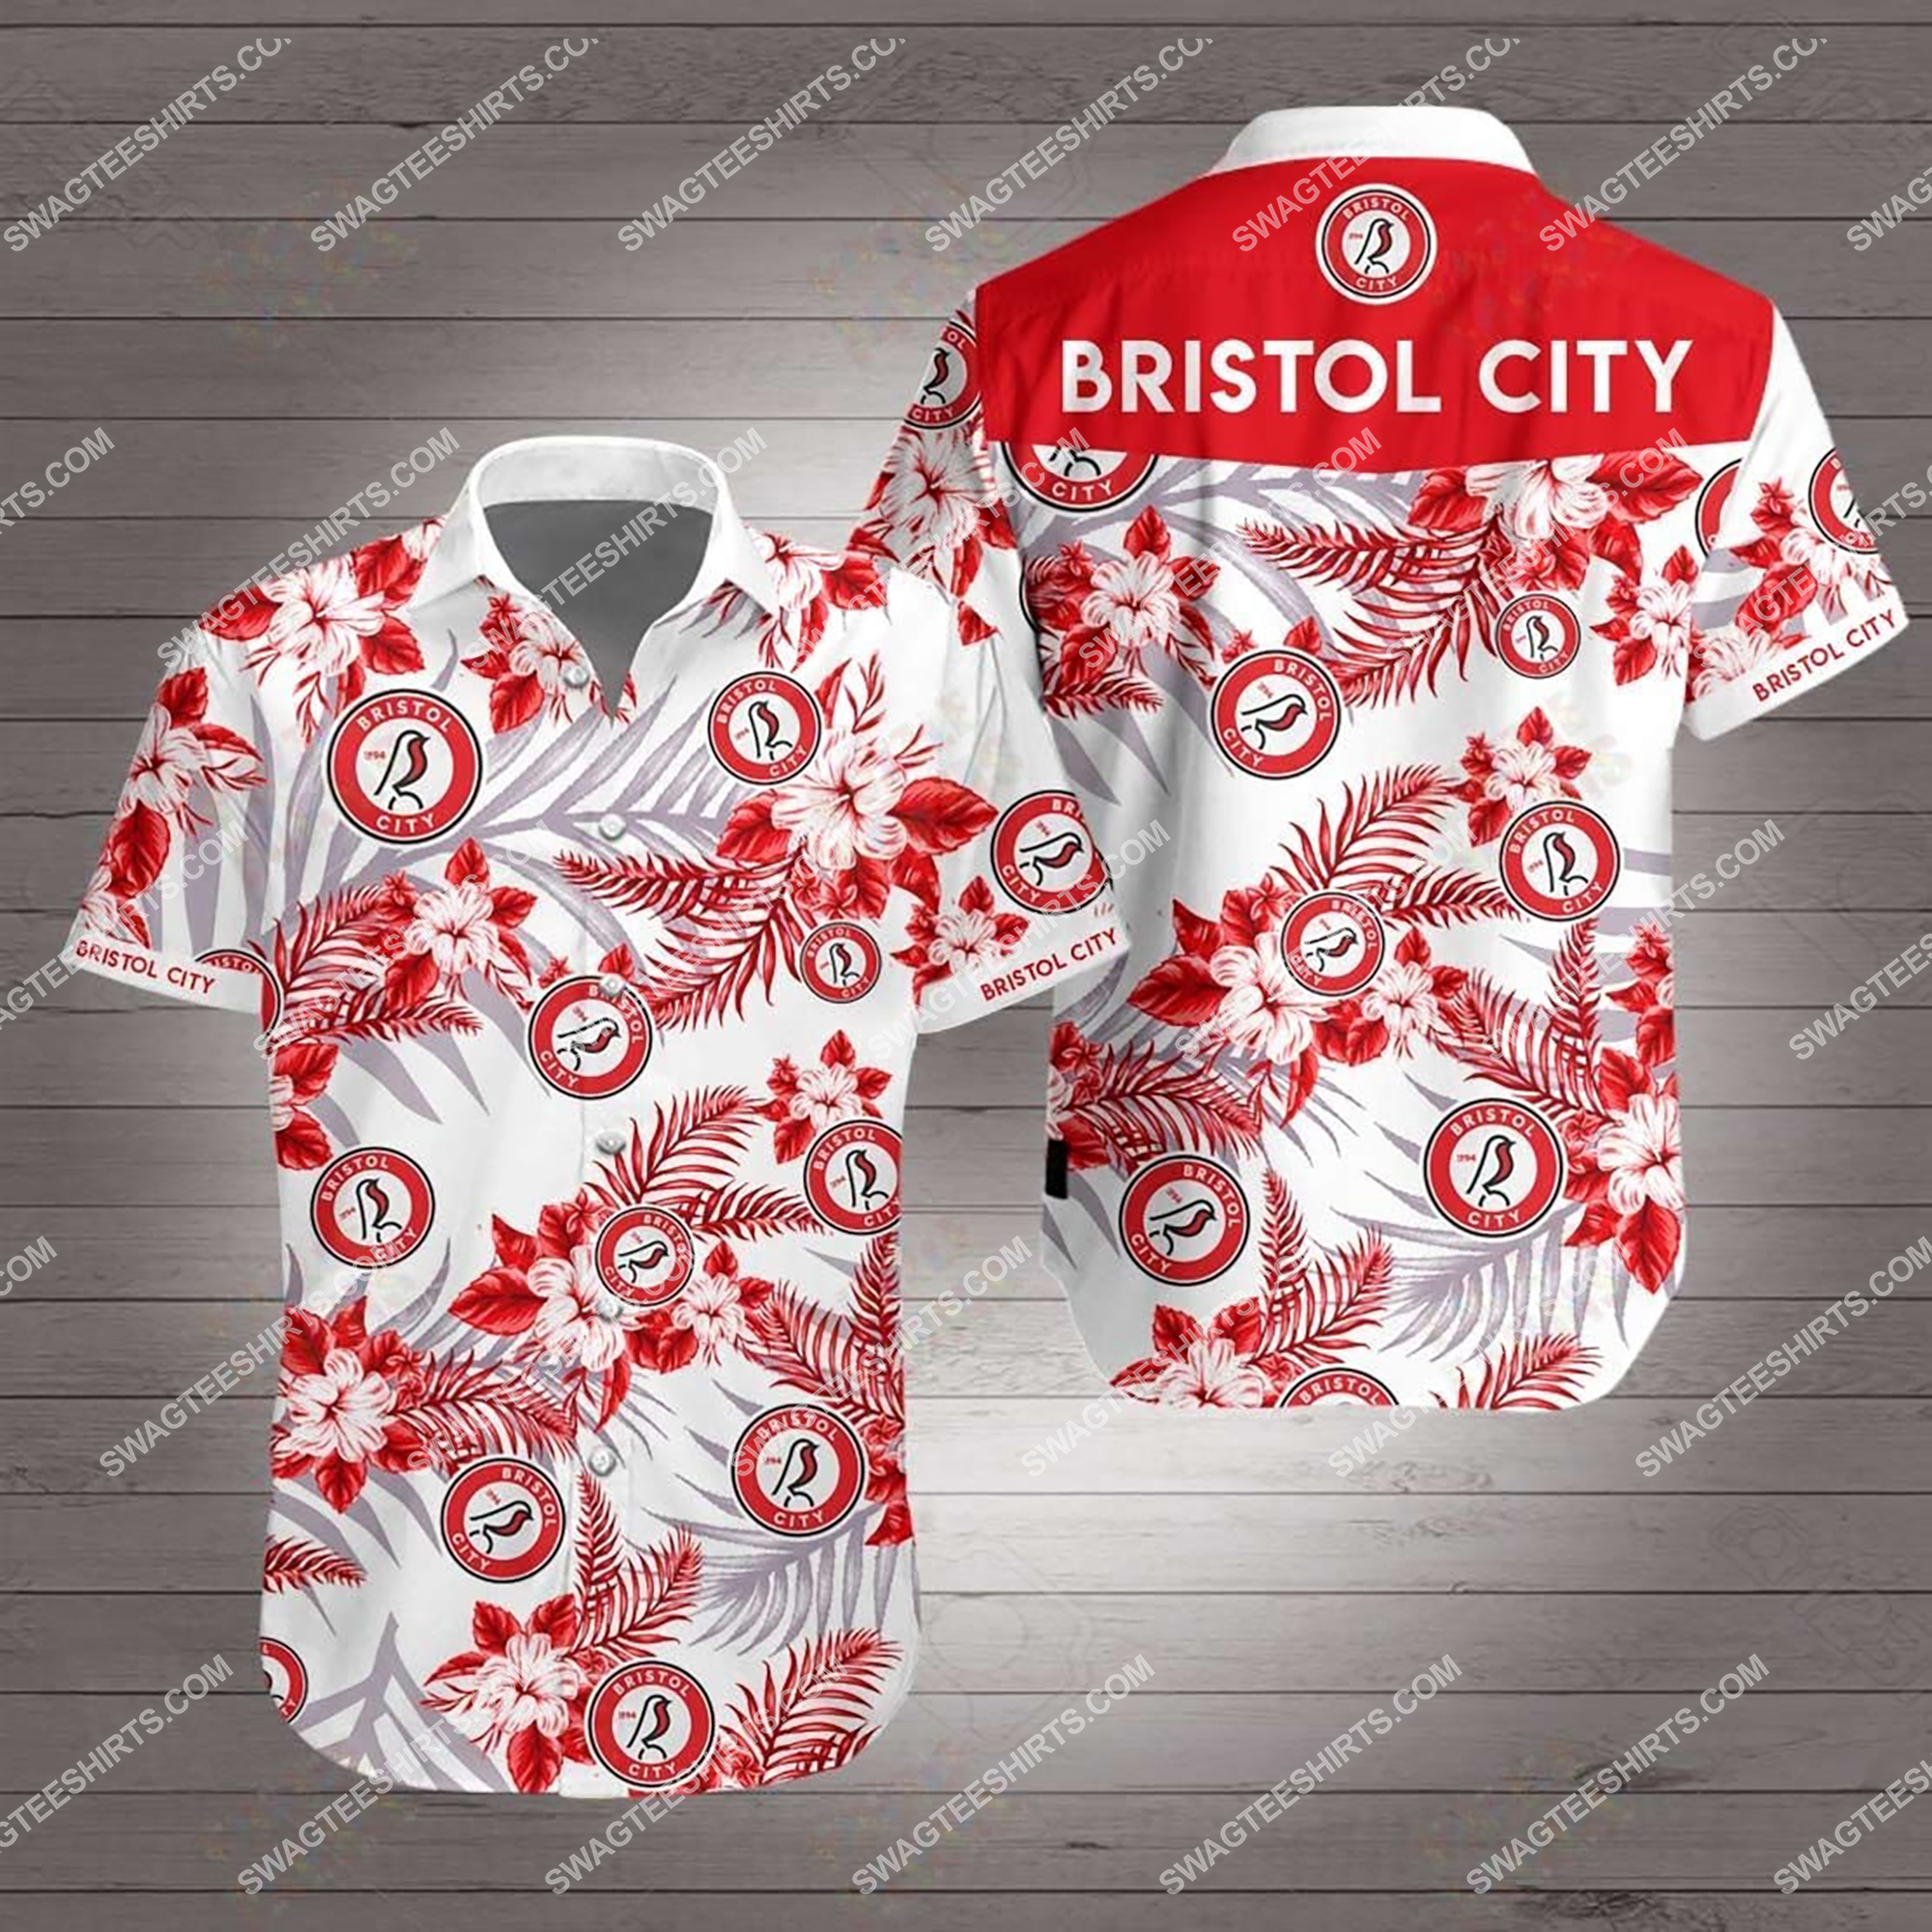 the bristol city fc full printing summer hawaiian shirt 2